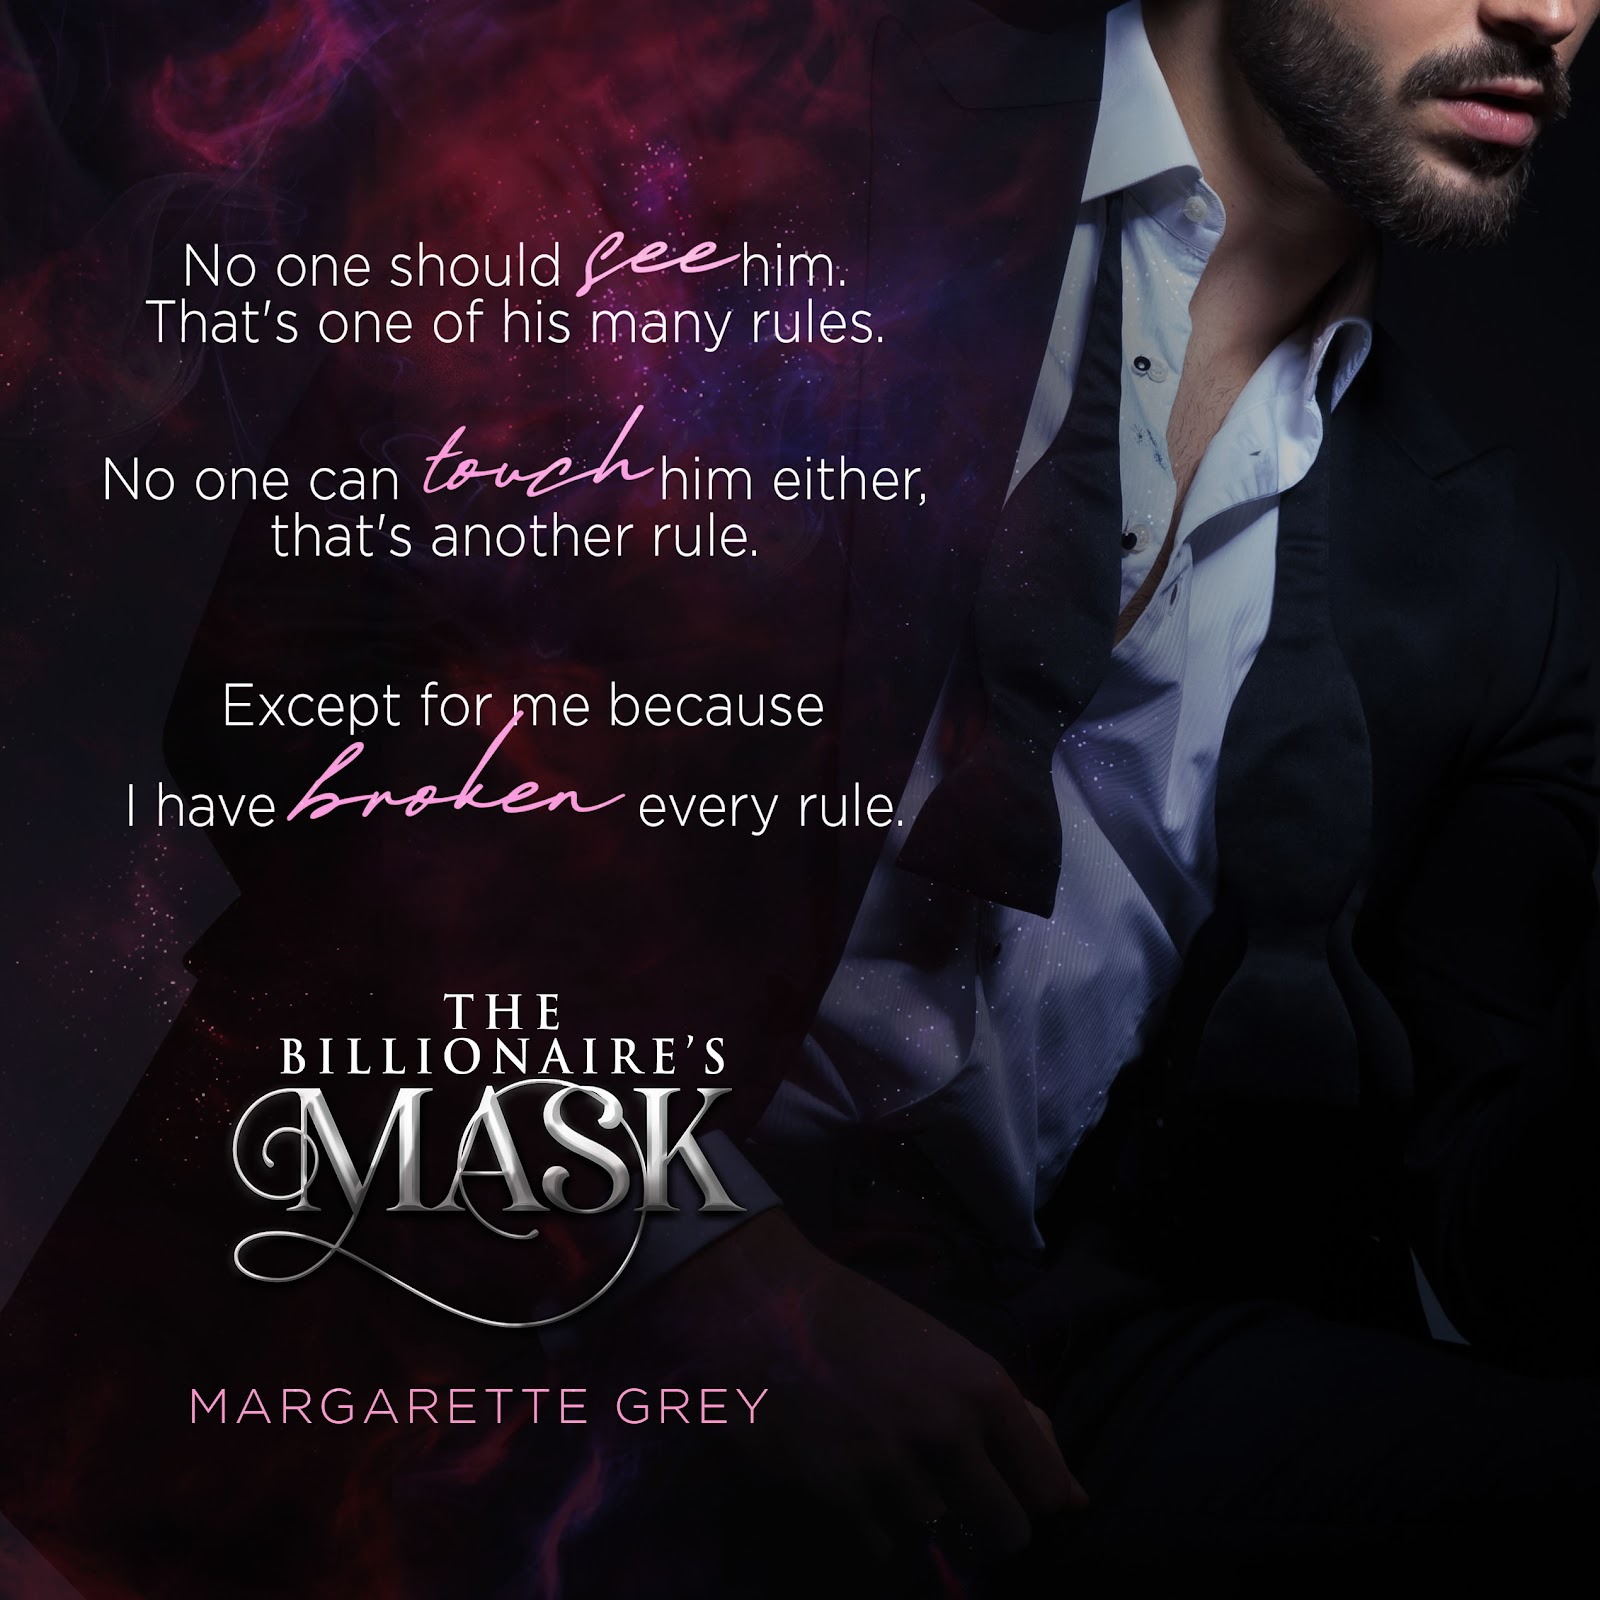 April 5th The Billionaire's Mask Teaser